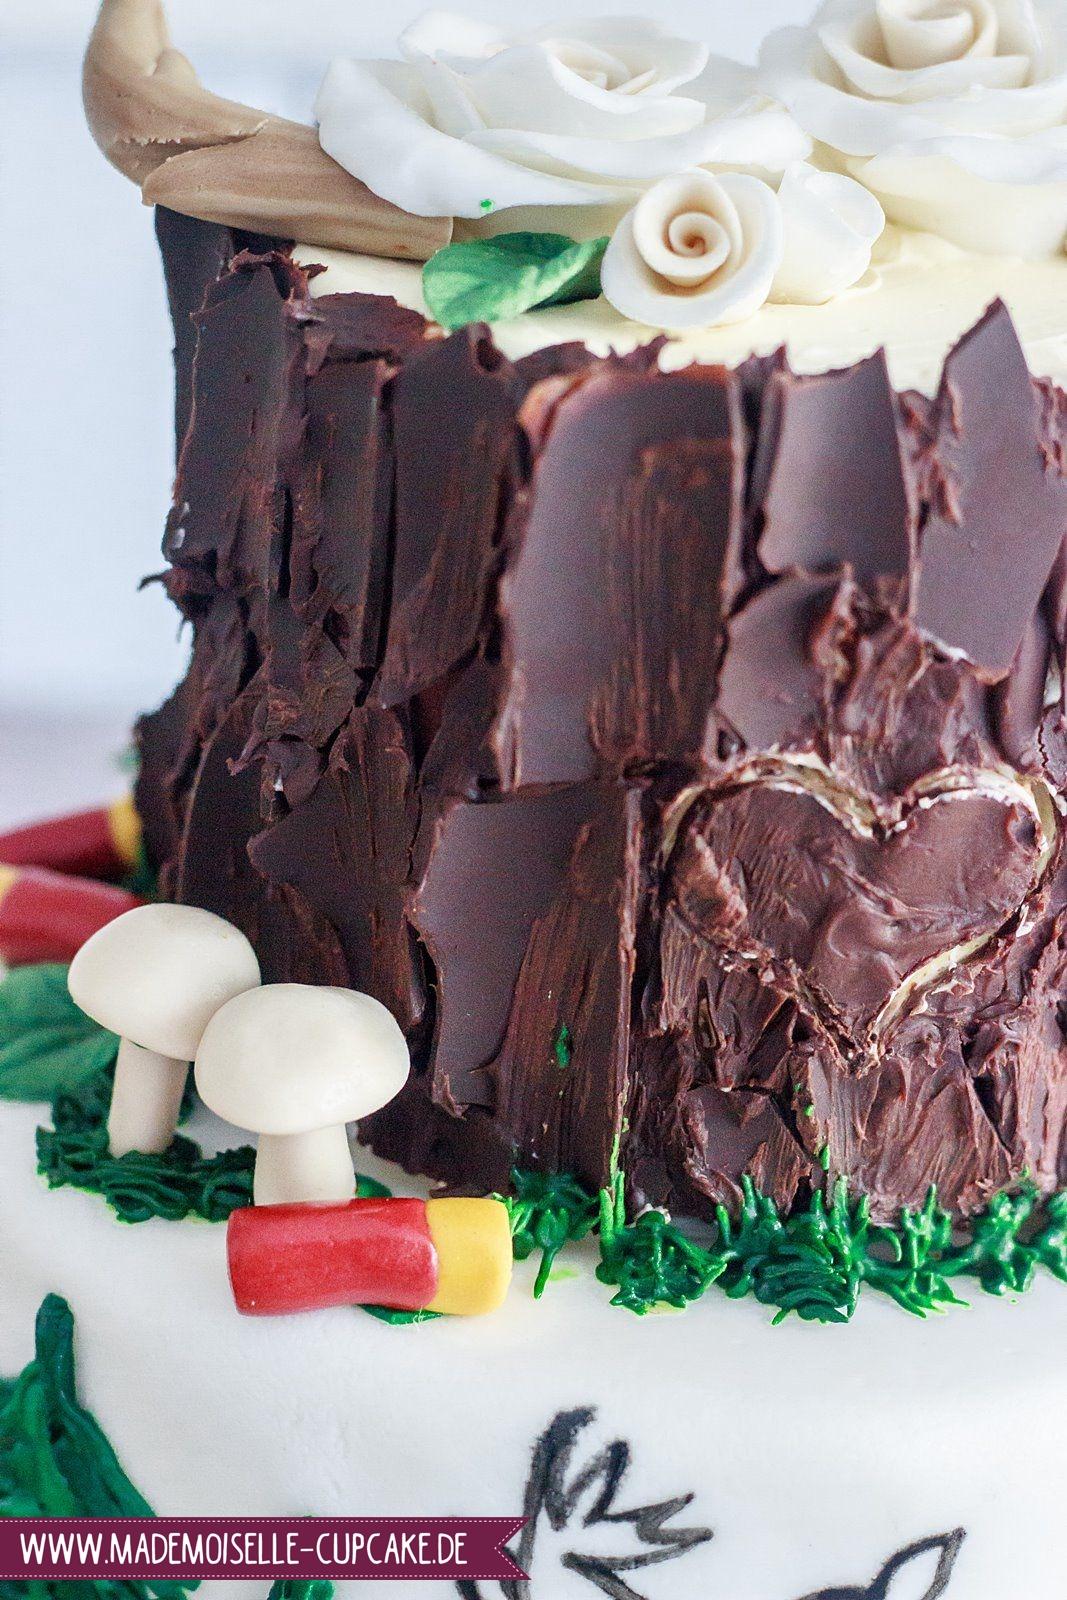 Img 6800 Mademoiselle Cupcake